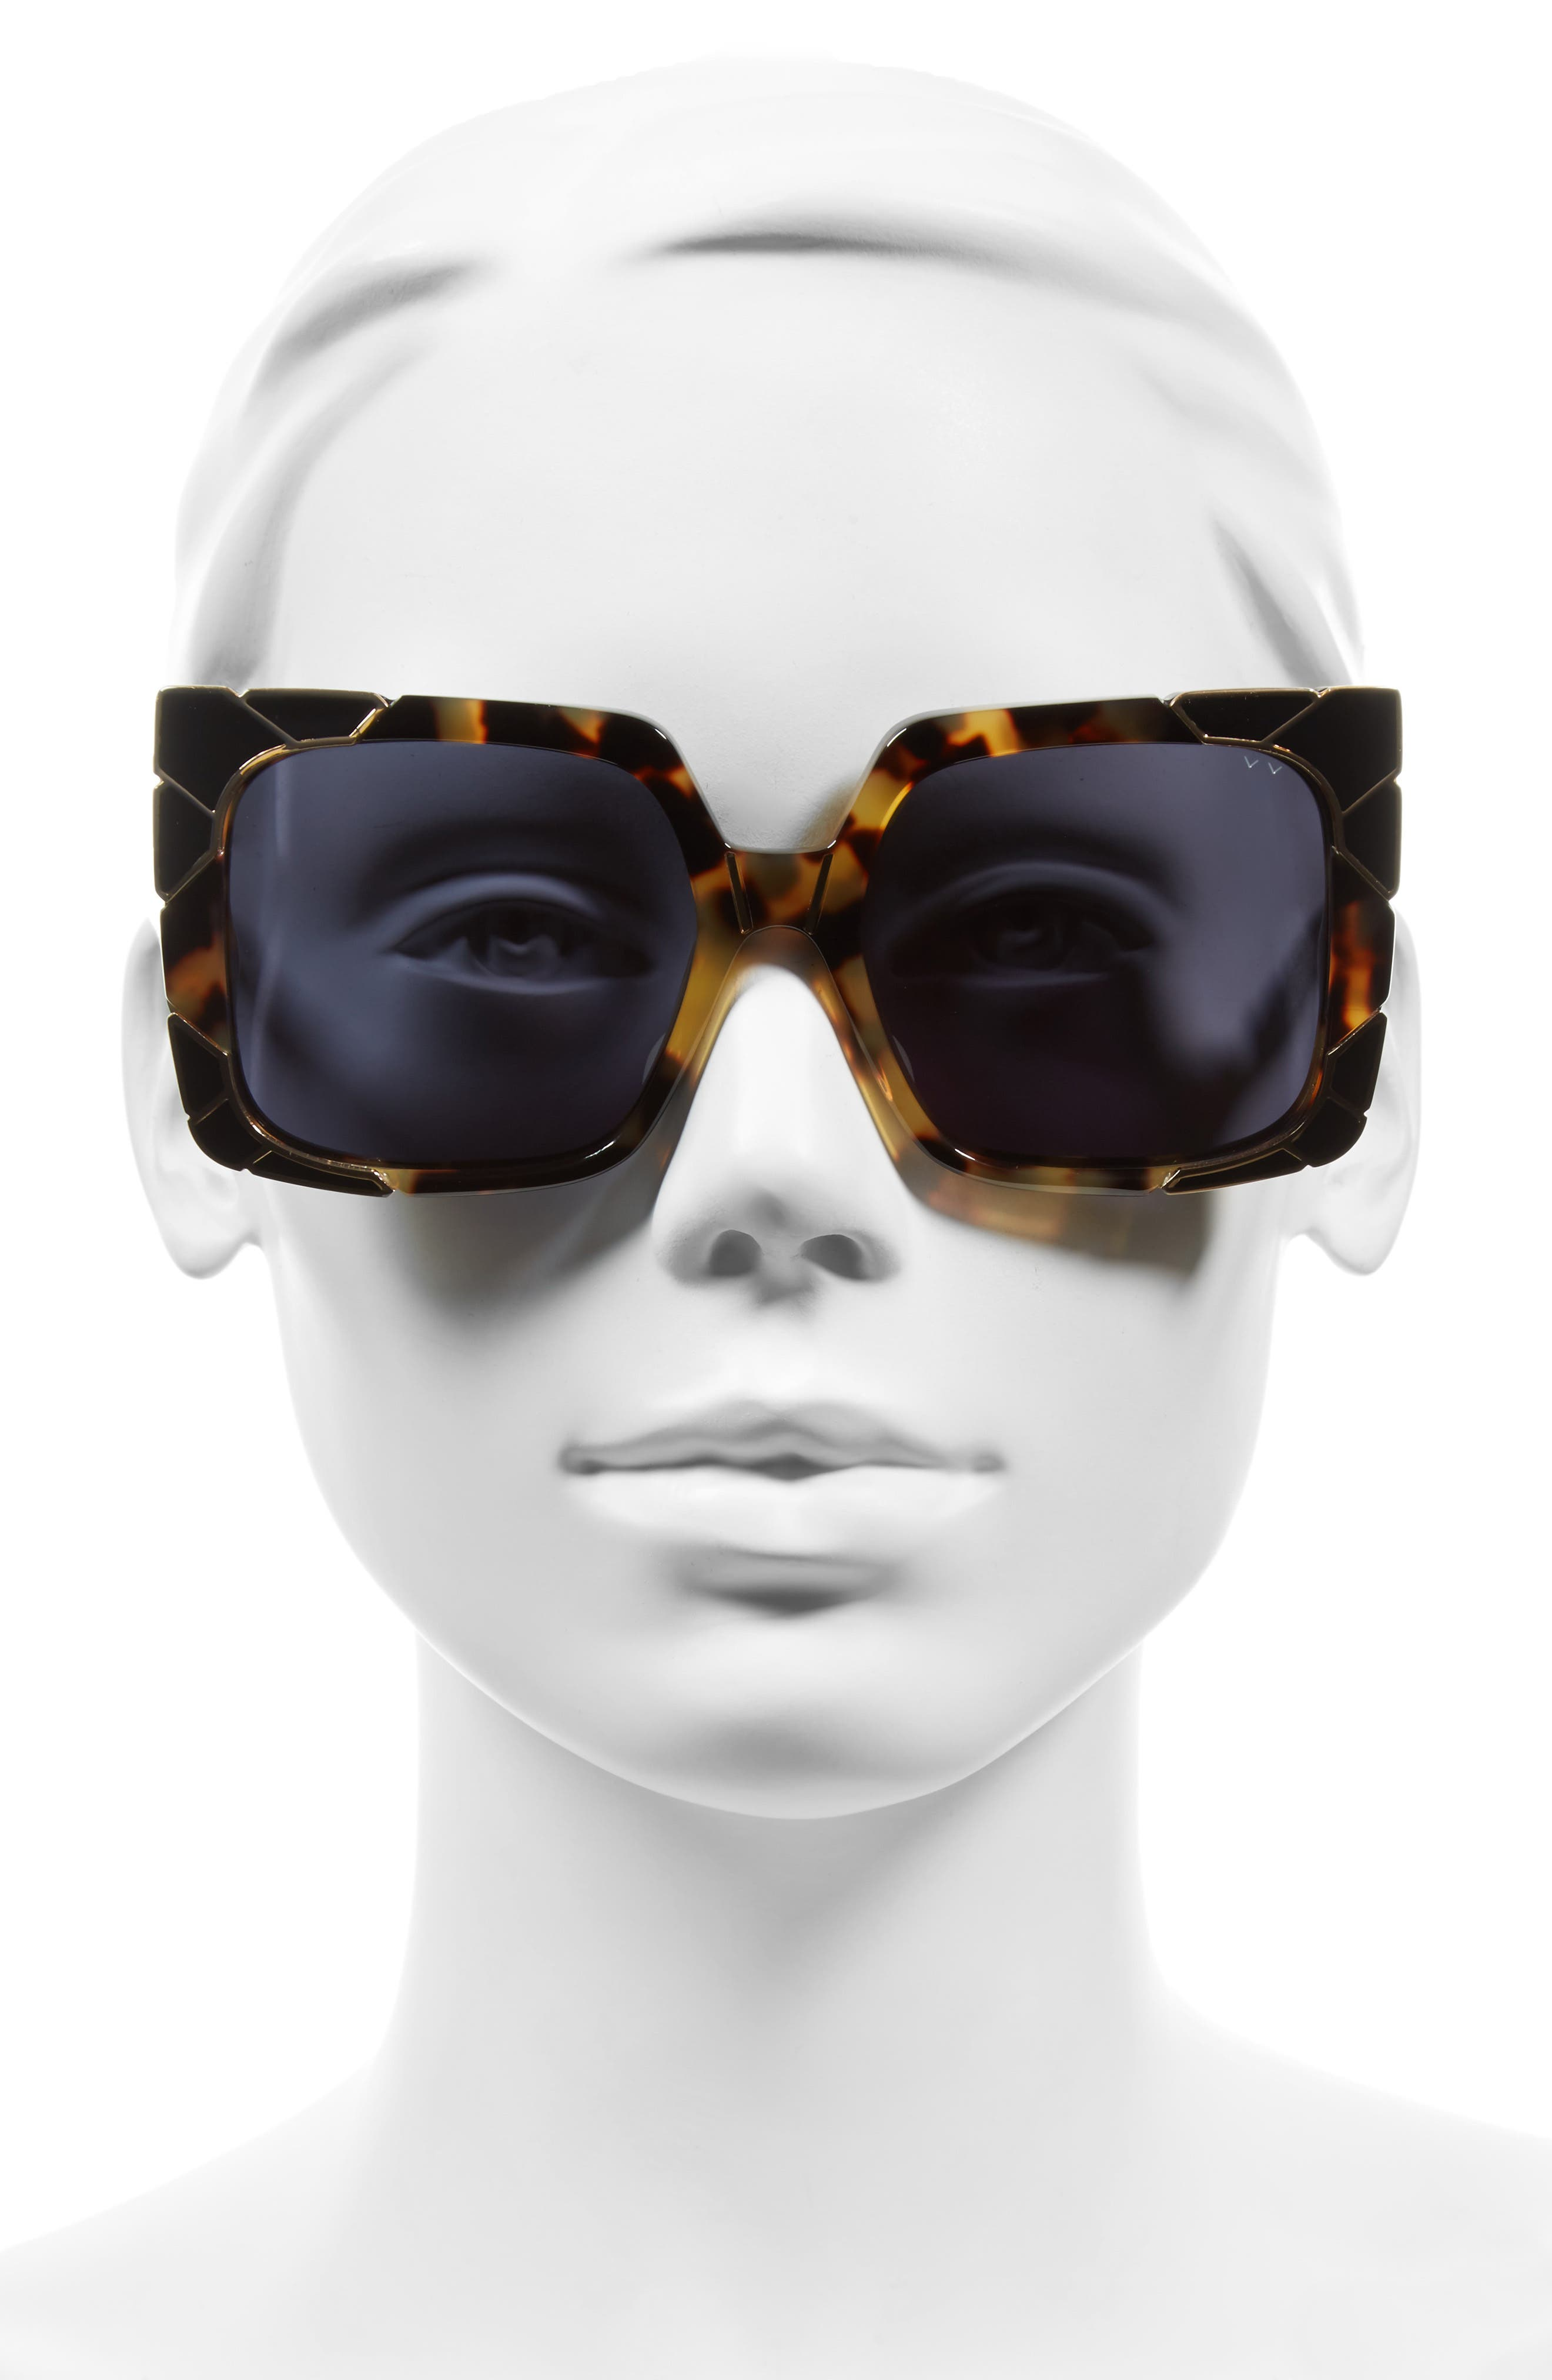 Sun & Shade 55mm Square Retro Sunglasses,                             Alternate thumbnail 2, color,                             DARK TORTOISE/ GOLD/ GREY